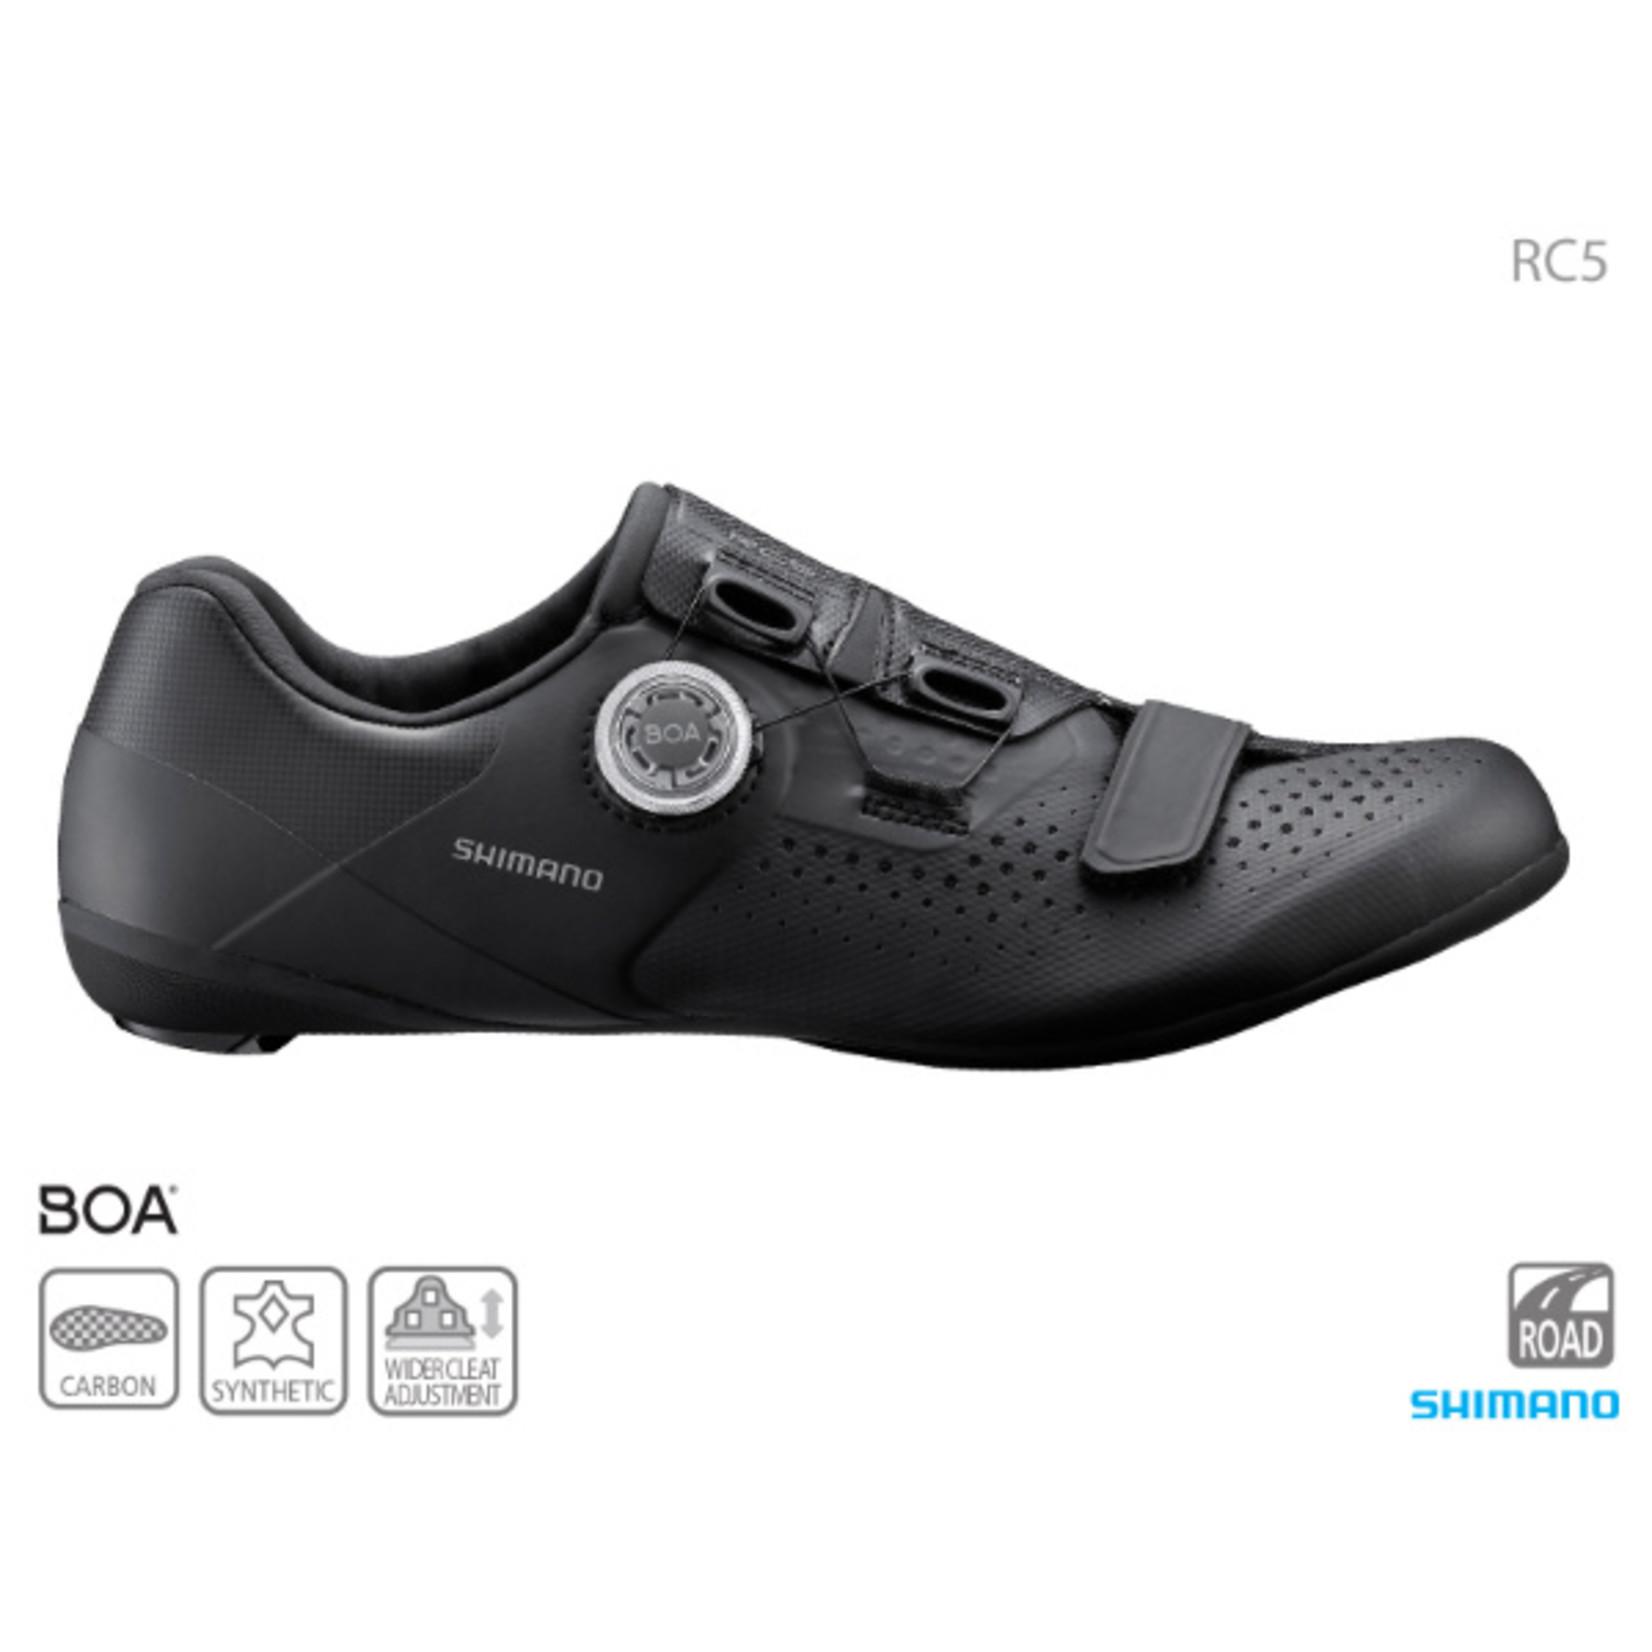 Shimano RC5 Road shoe Black